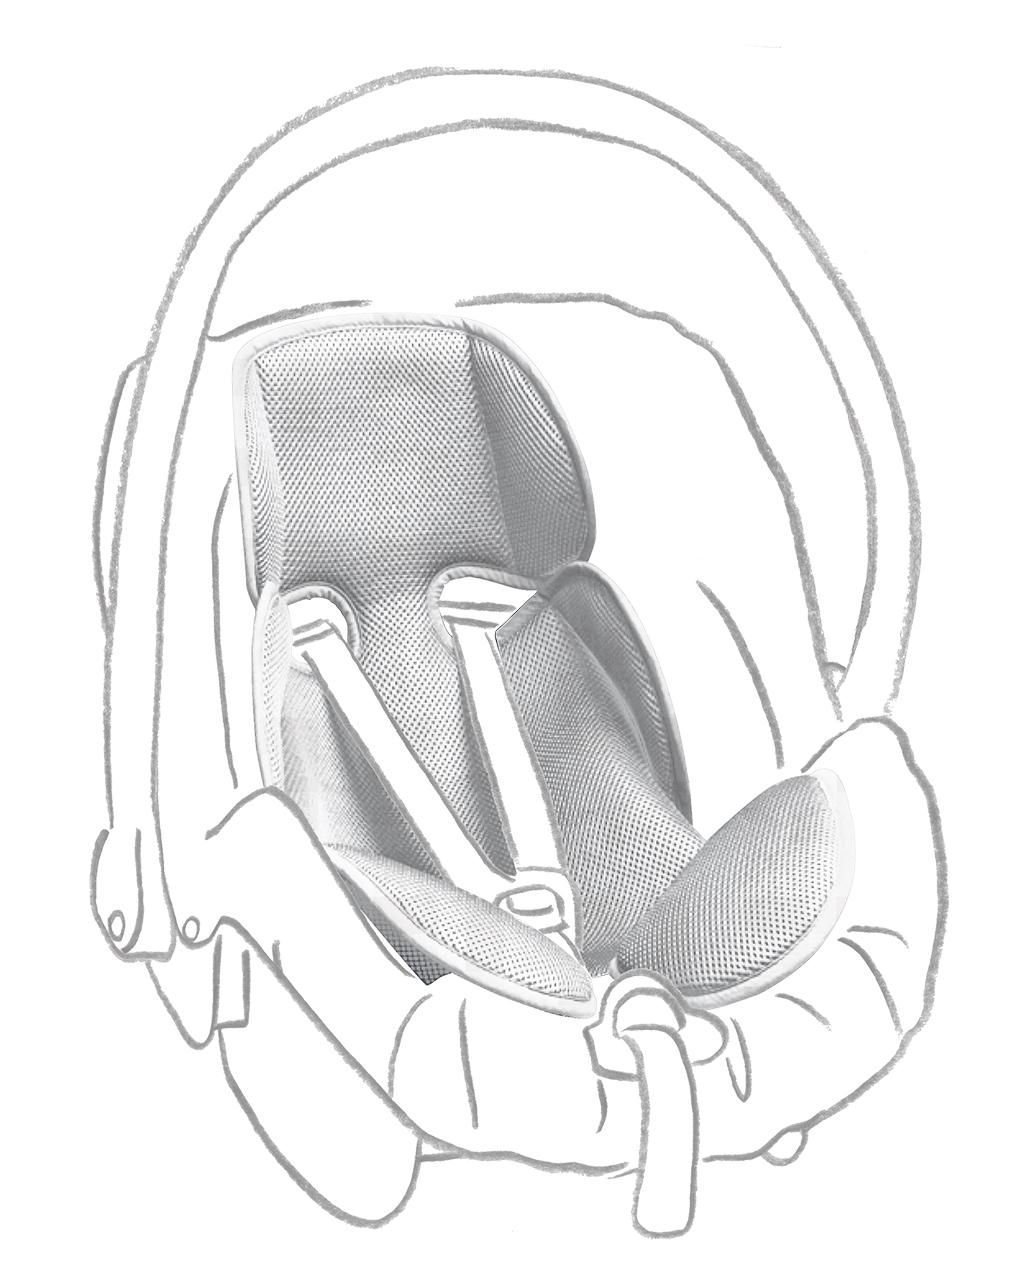 Giordani Στρώμα Αφρού Για Κάθισμα Αυτοκινήτου Γκρουπ 0+ Γκρι